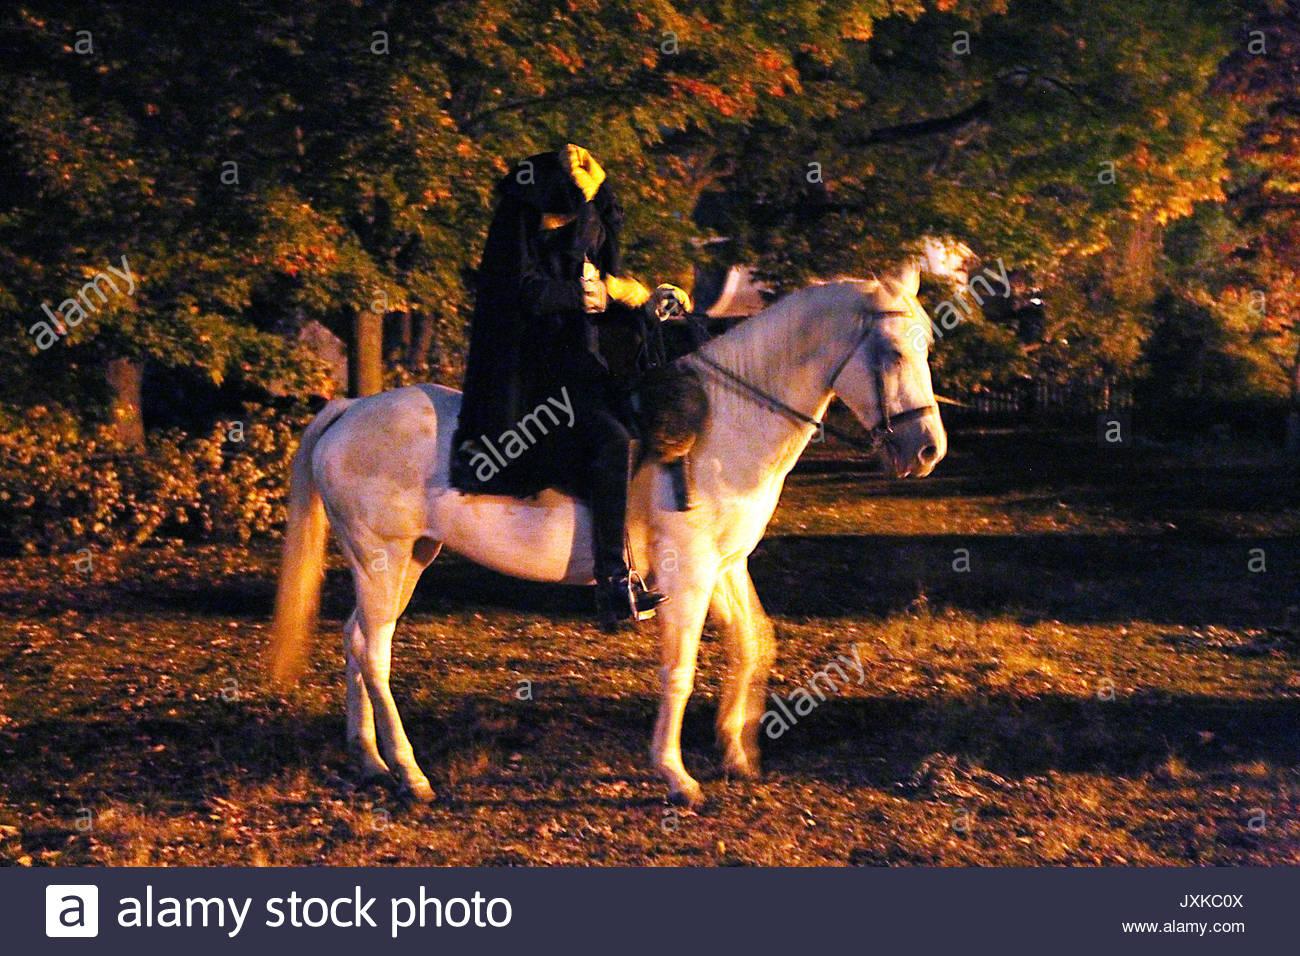 The Headless Horseman. Events surrounding Halloween in Sleepy ...